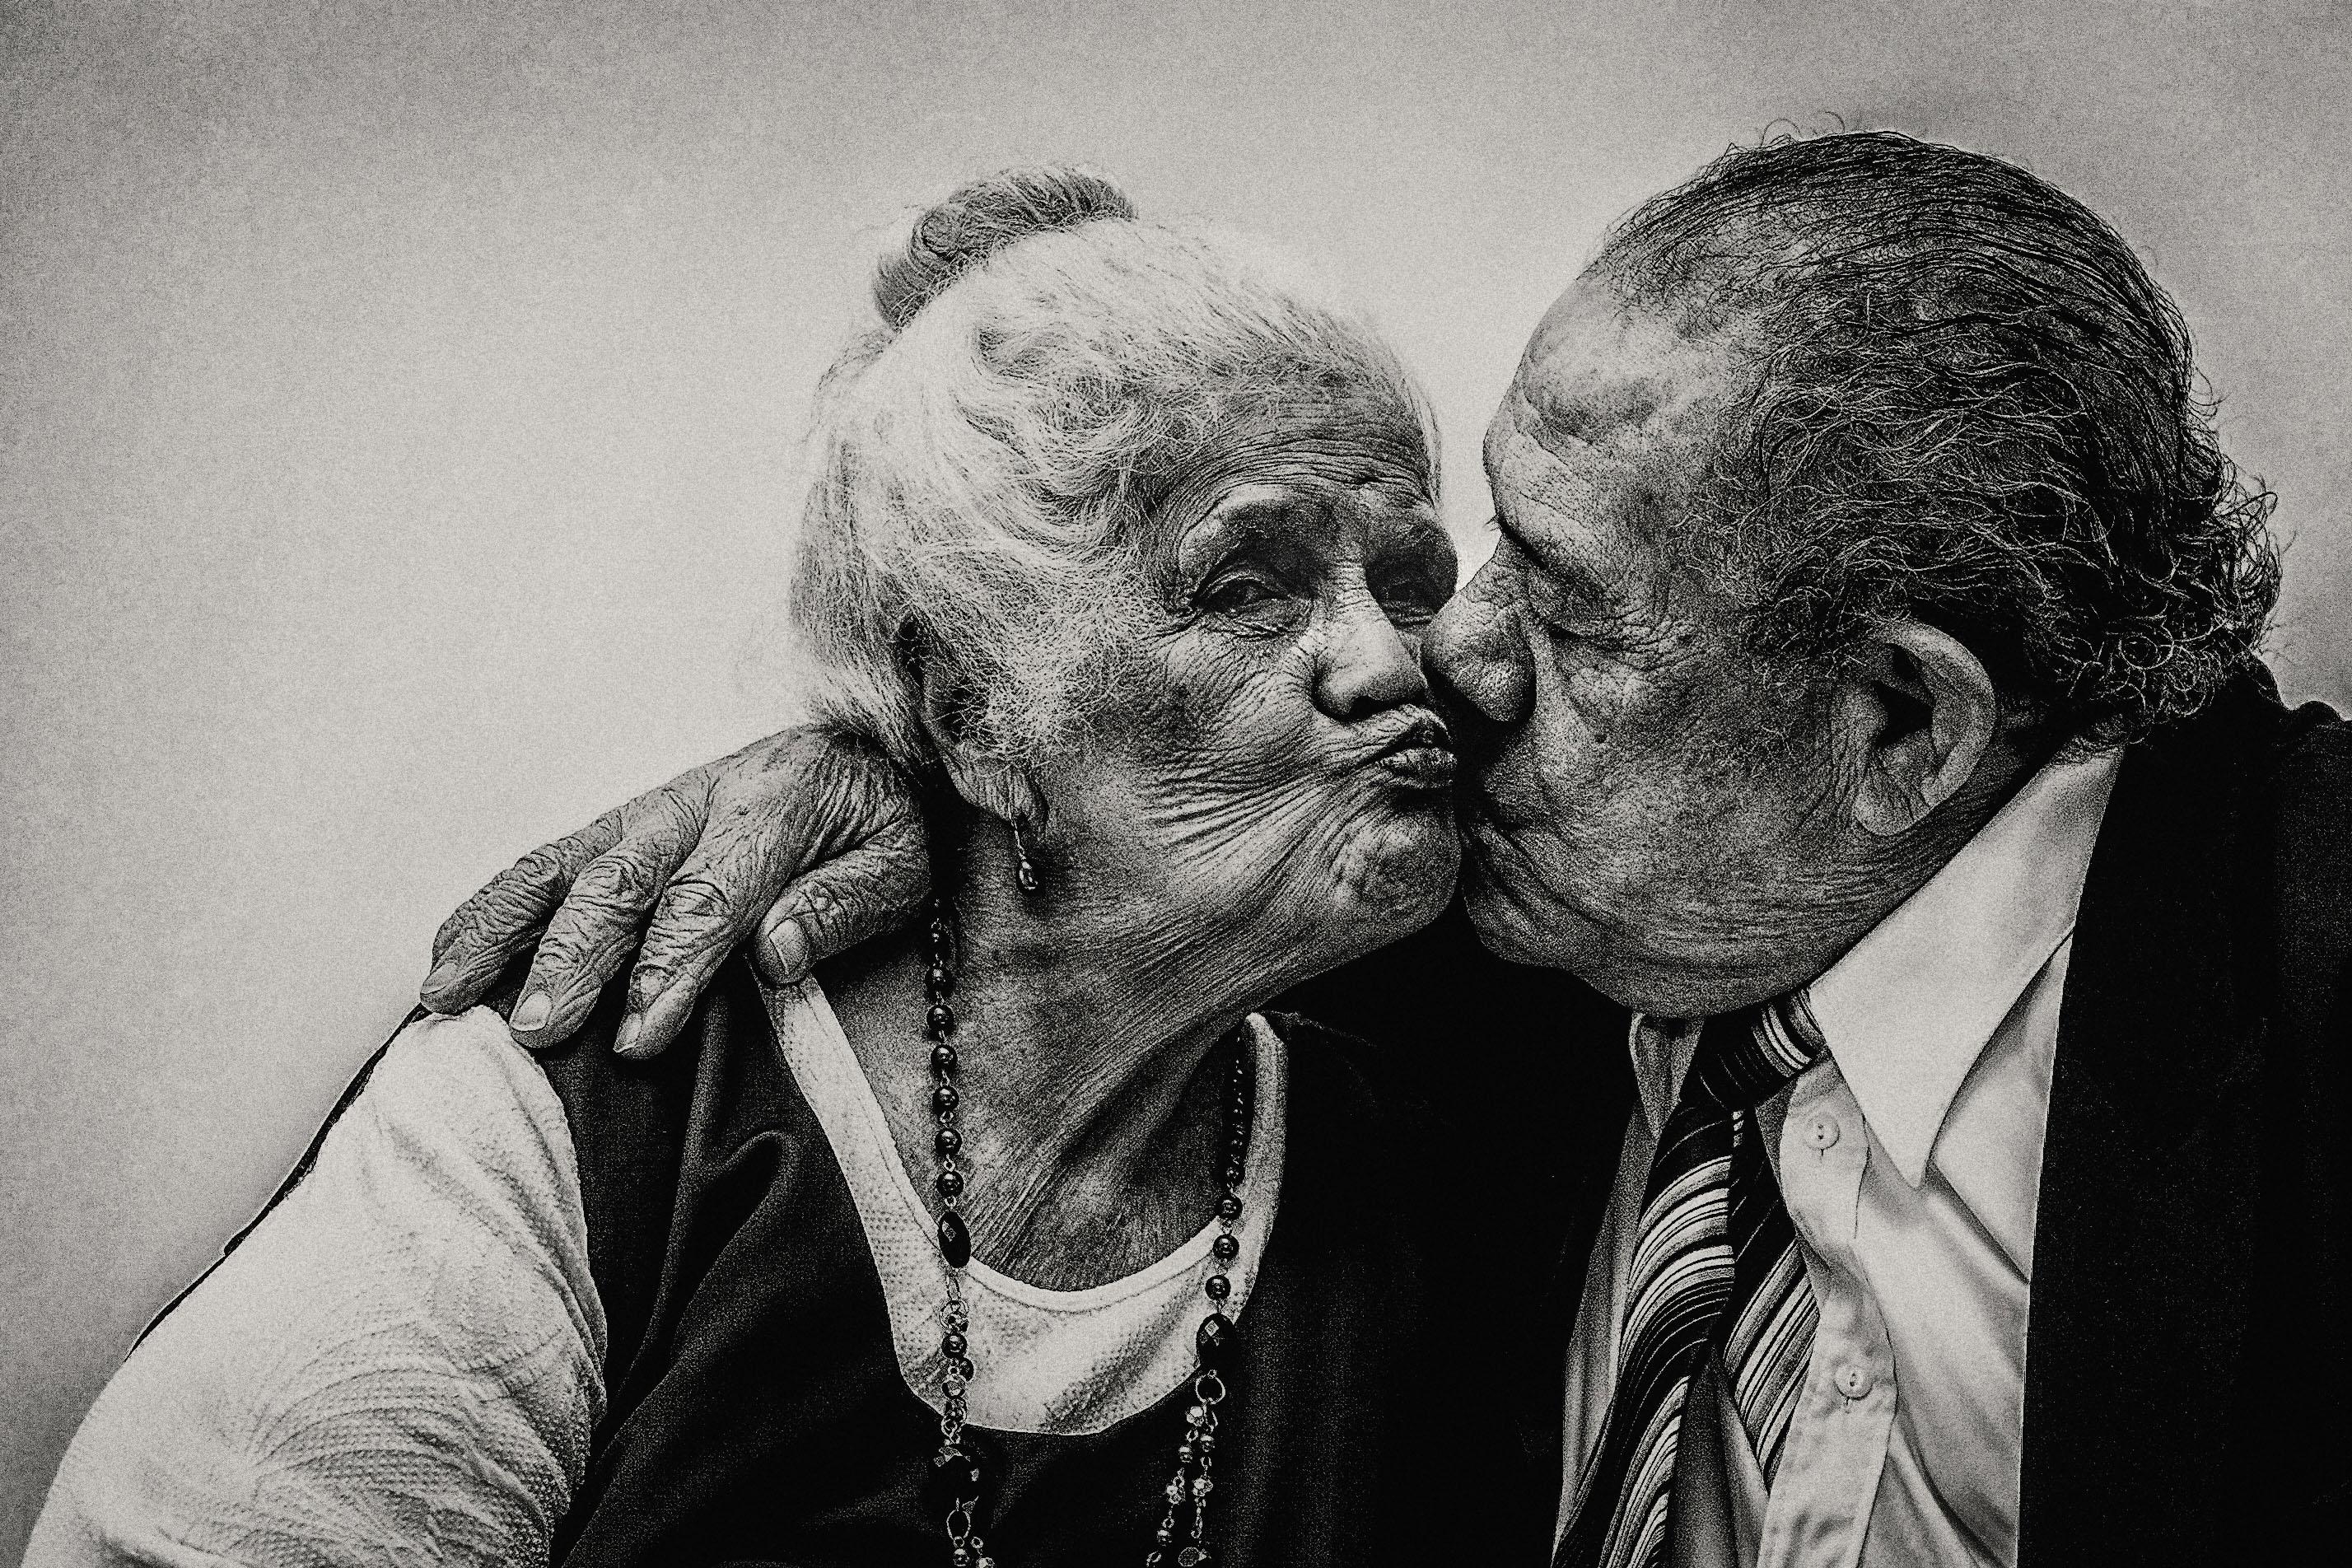 Trustpower-Photographic-Exhibition-2020-Lisa-Monk-Photography-4.jpg